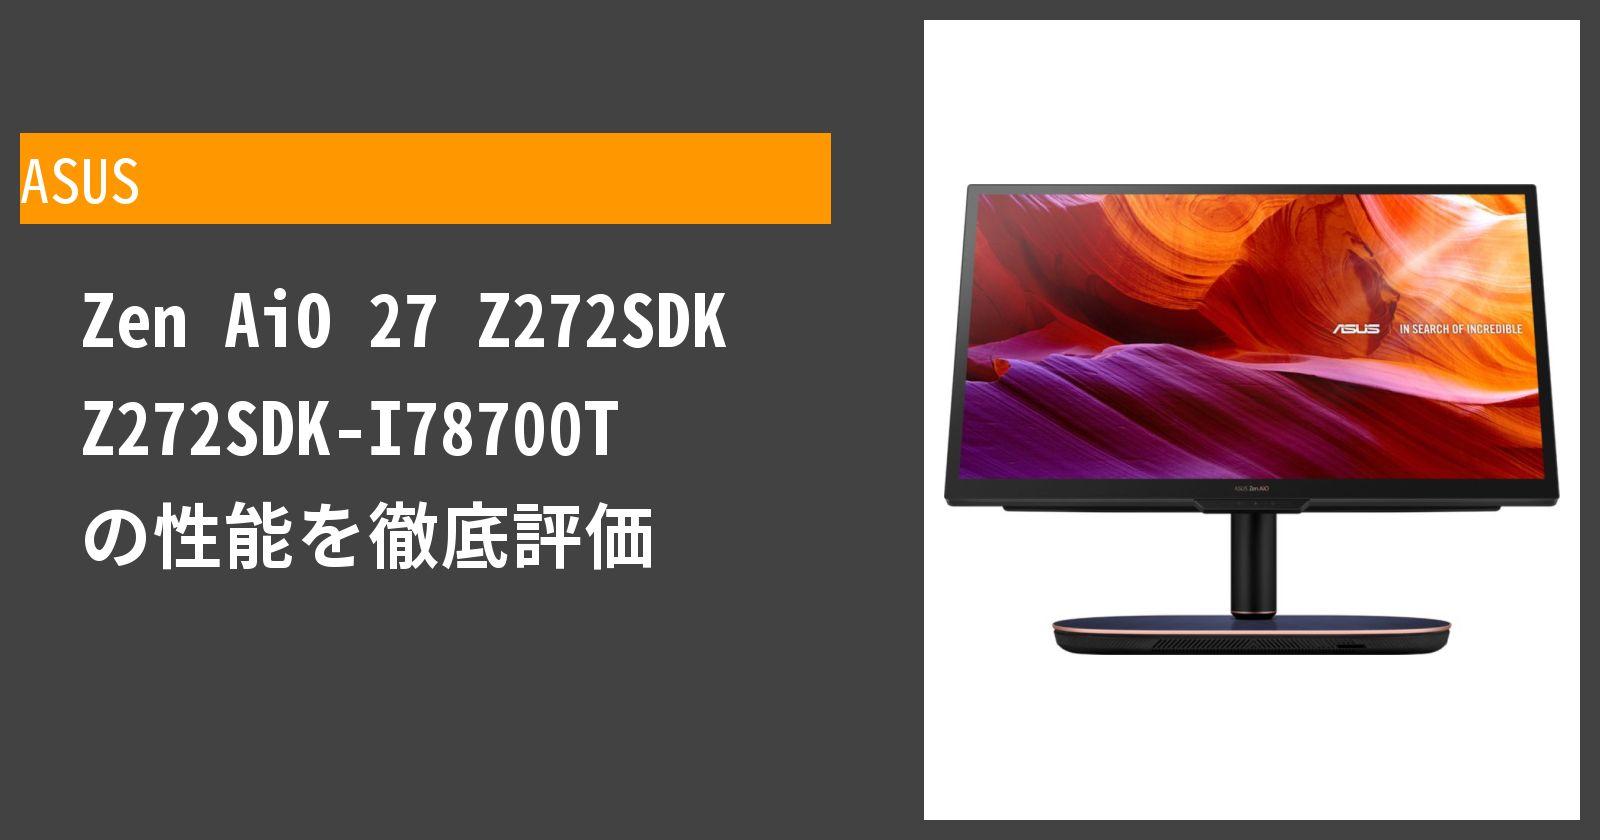 Zen AiO 27 Z272SDK Z272SDK-I78700T の性能を徹底評価